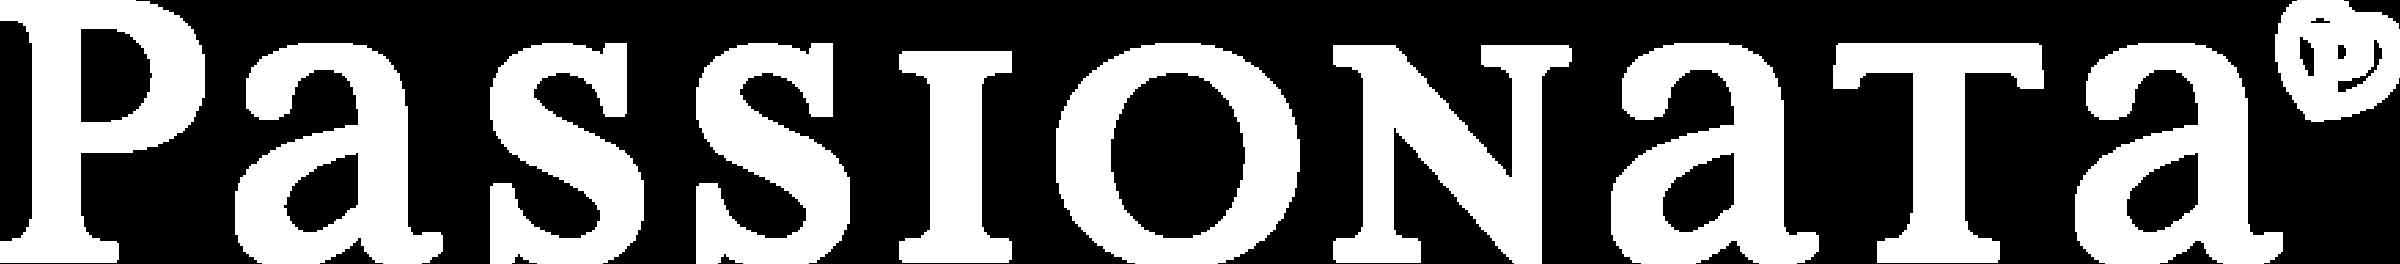 PASSIONATA Logo